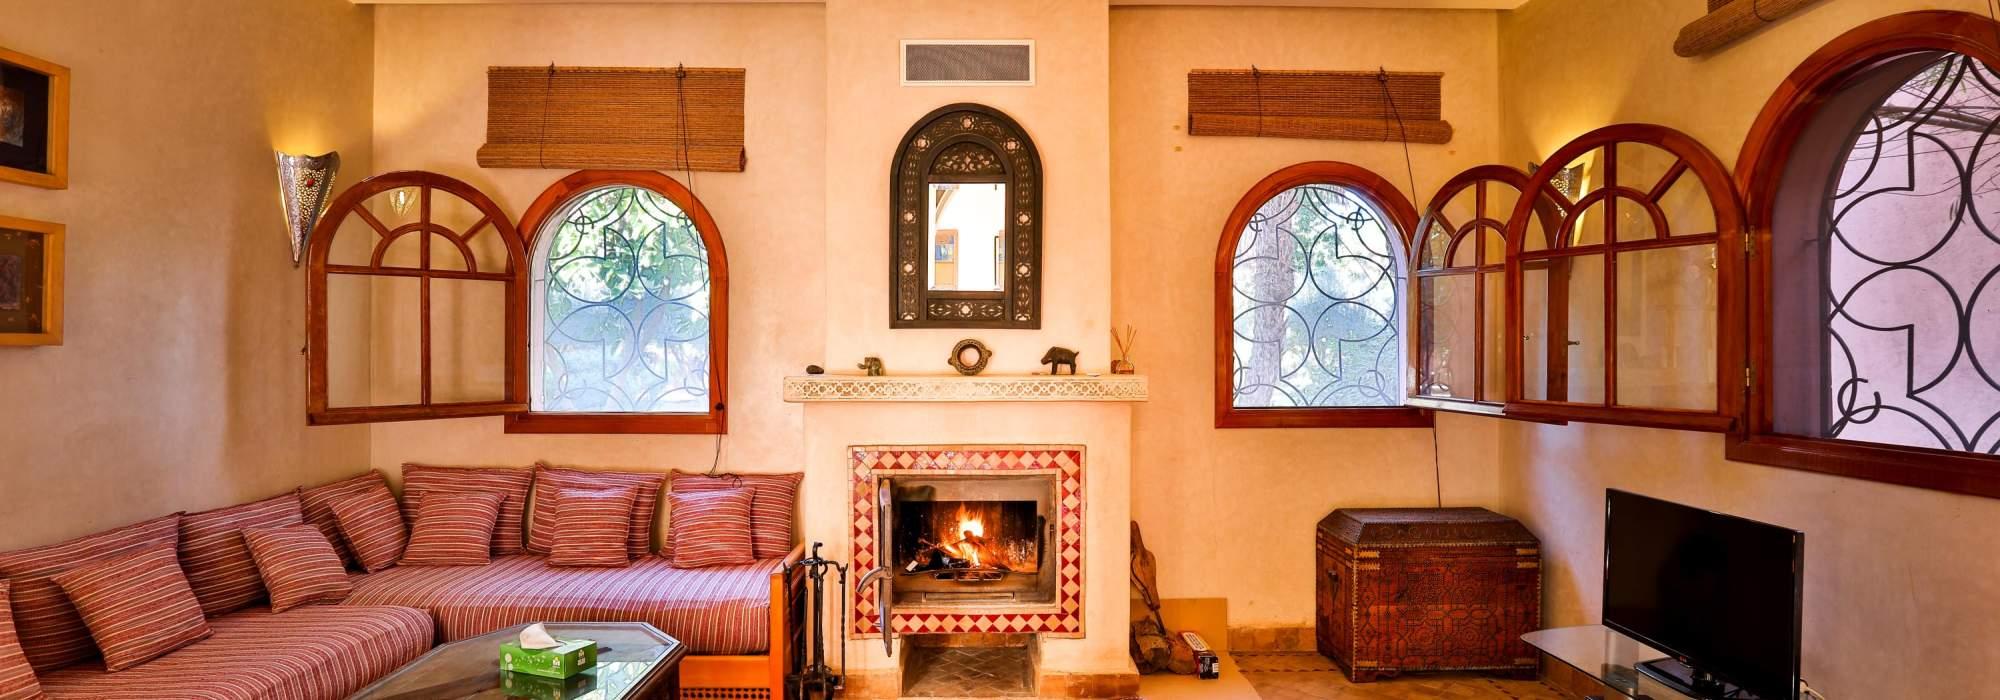 coquette villa riad situé à la palmeraie Marrakech